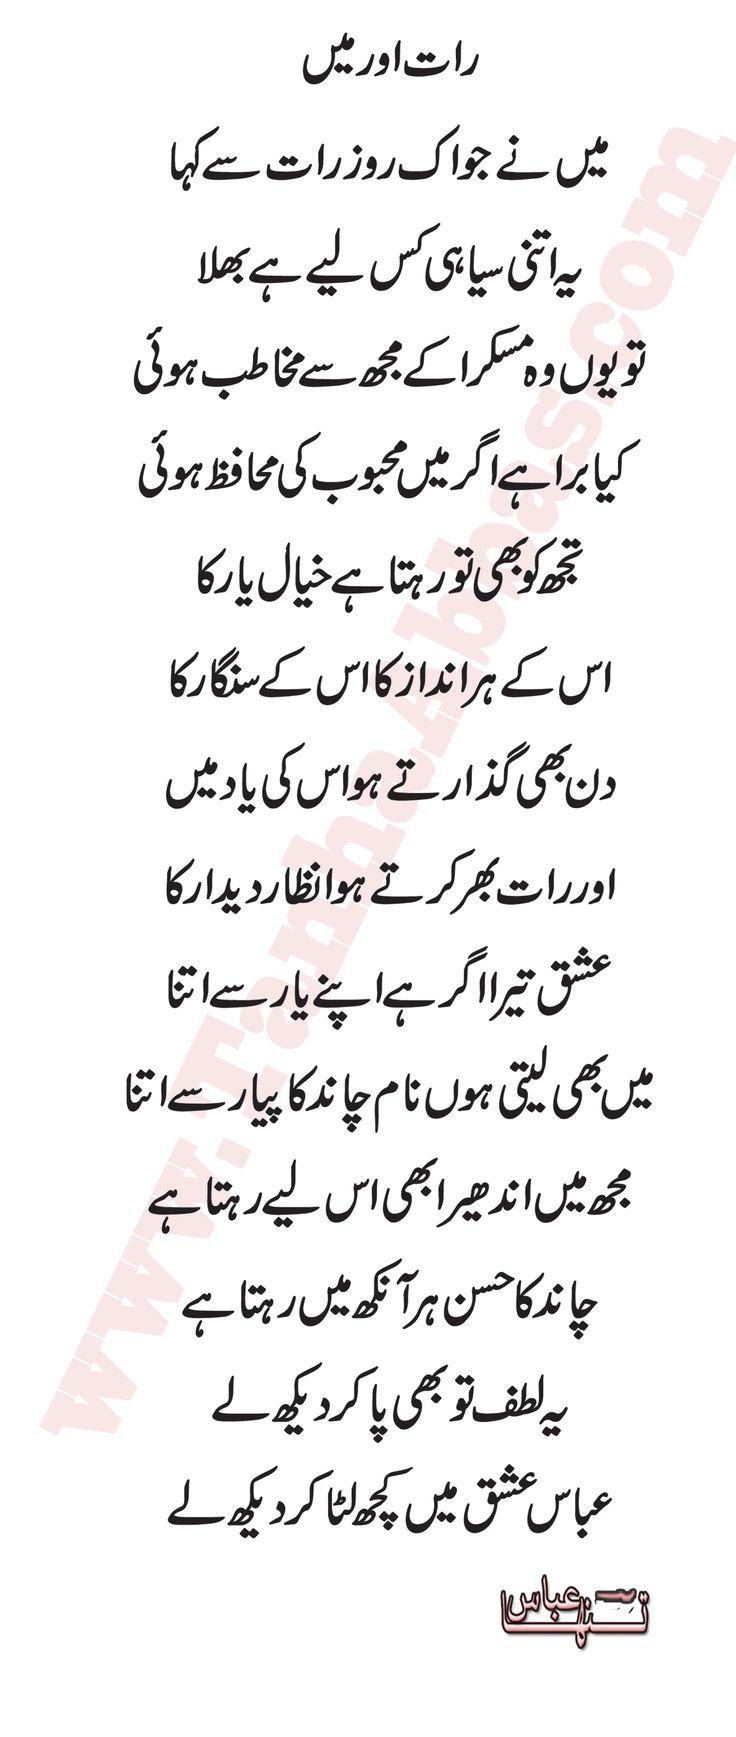 urdu ghazal   best ghazal   tanha abbas ghazal   poem   nazam   urdu shayari   urdu design poetry   raat   raat aur maen   chand raat  raat poetry  chand poetry  tanha abbas urdu shayri